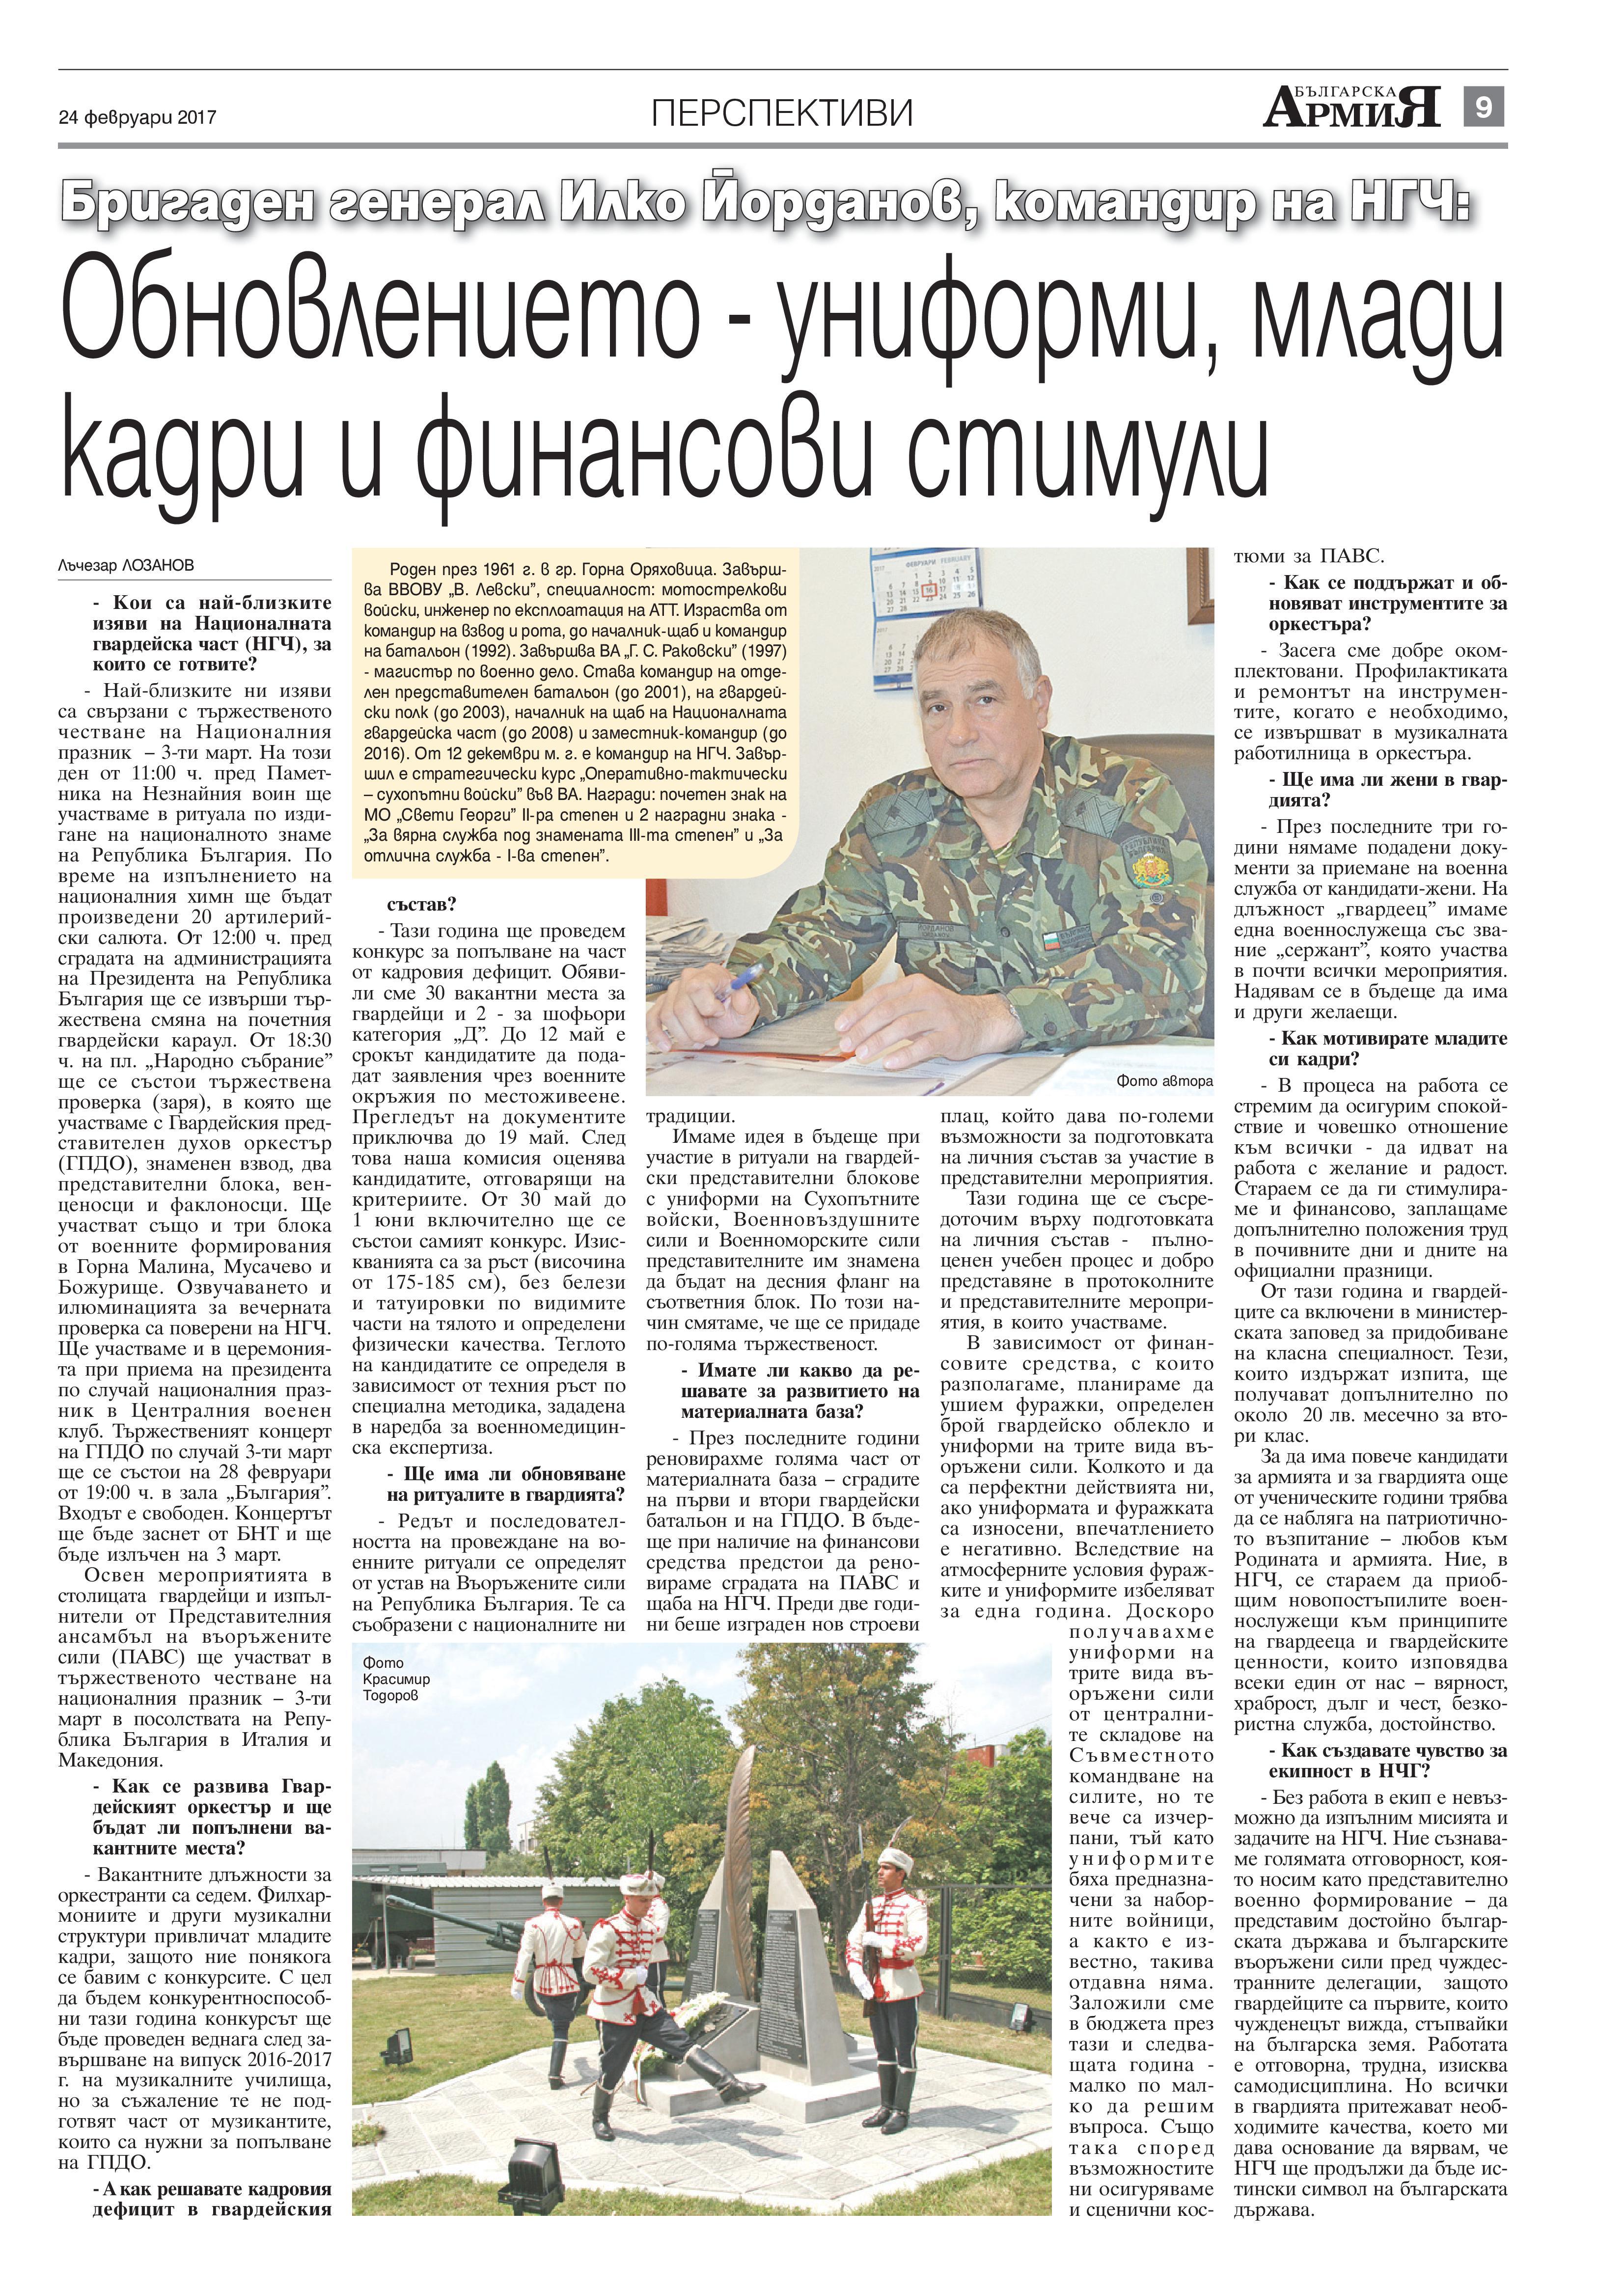 https://www.armymedia.bg/wp-content/uploads/2017/02/09-1.jpg